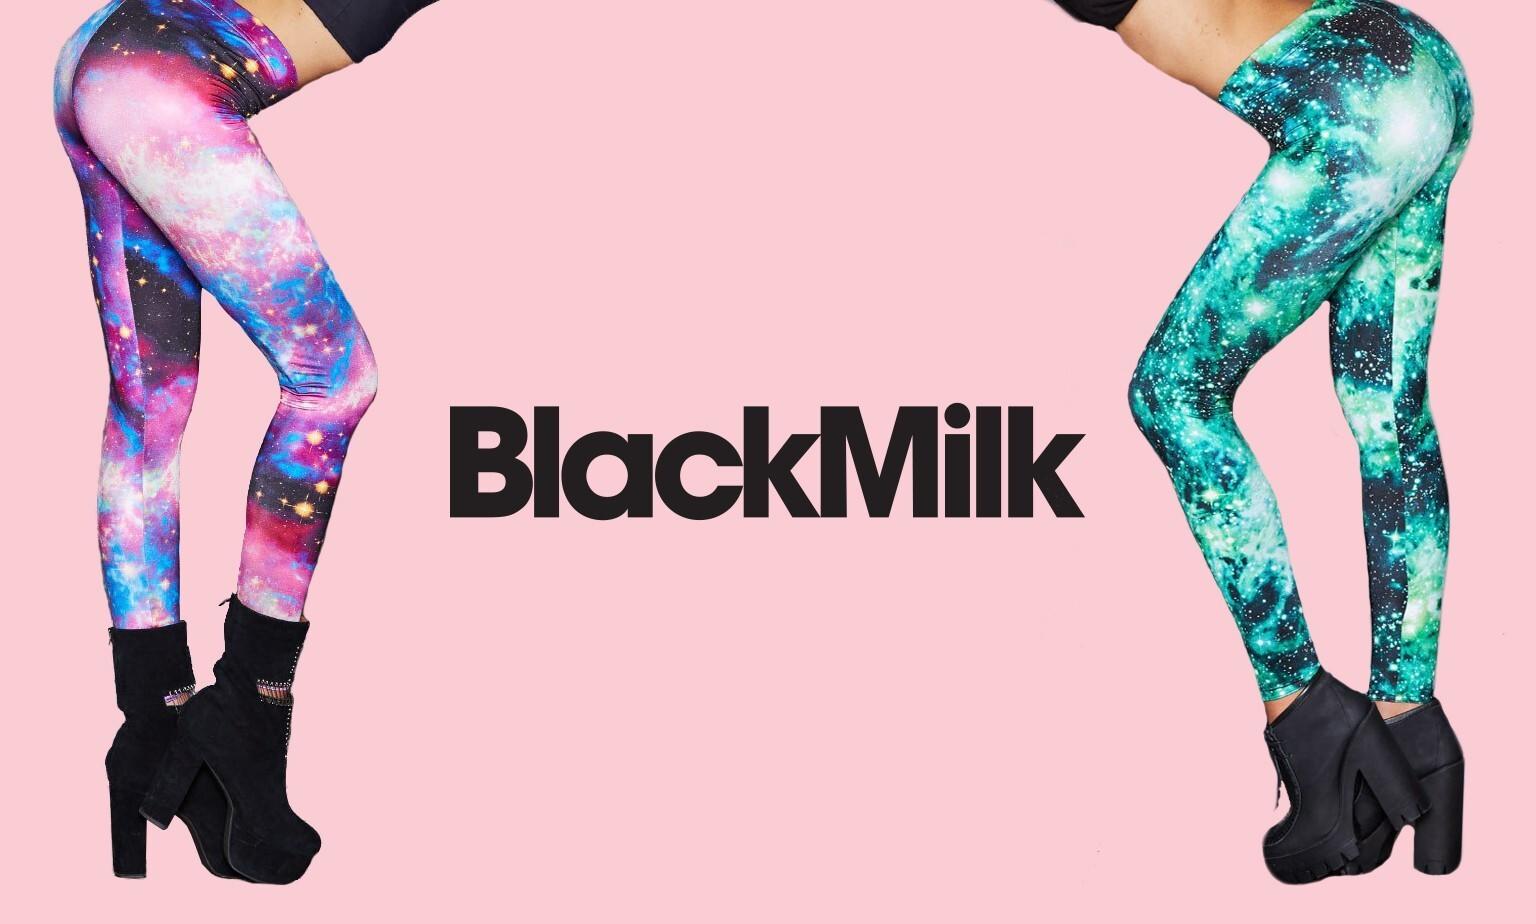 BlackMilk new to eBay